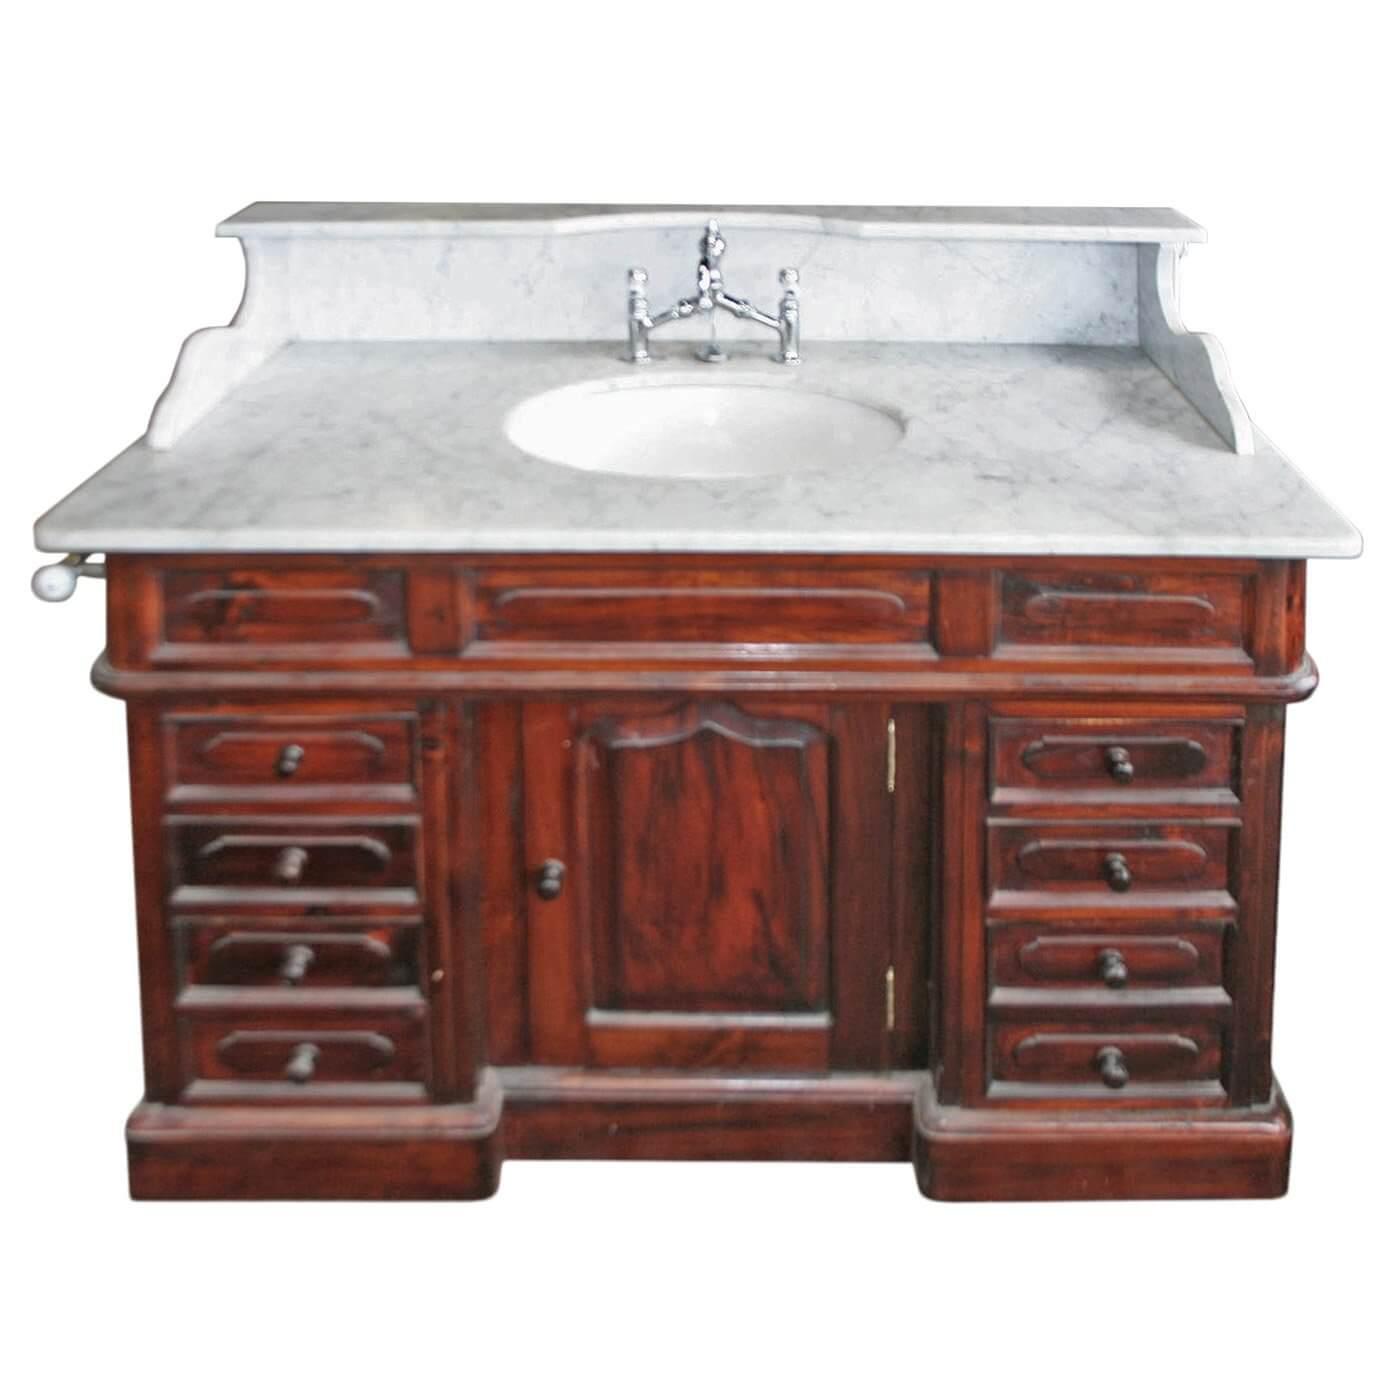 radiateur en fonte catalogue mat riaux anciens. Black Bedroom Furniture Sets. Home Design Ideas